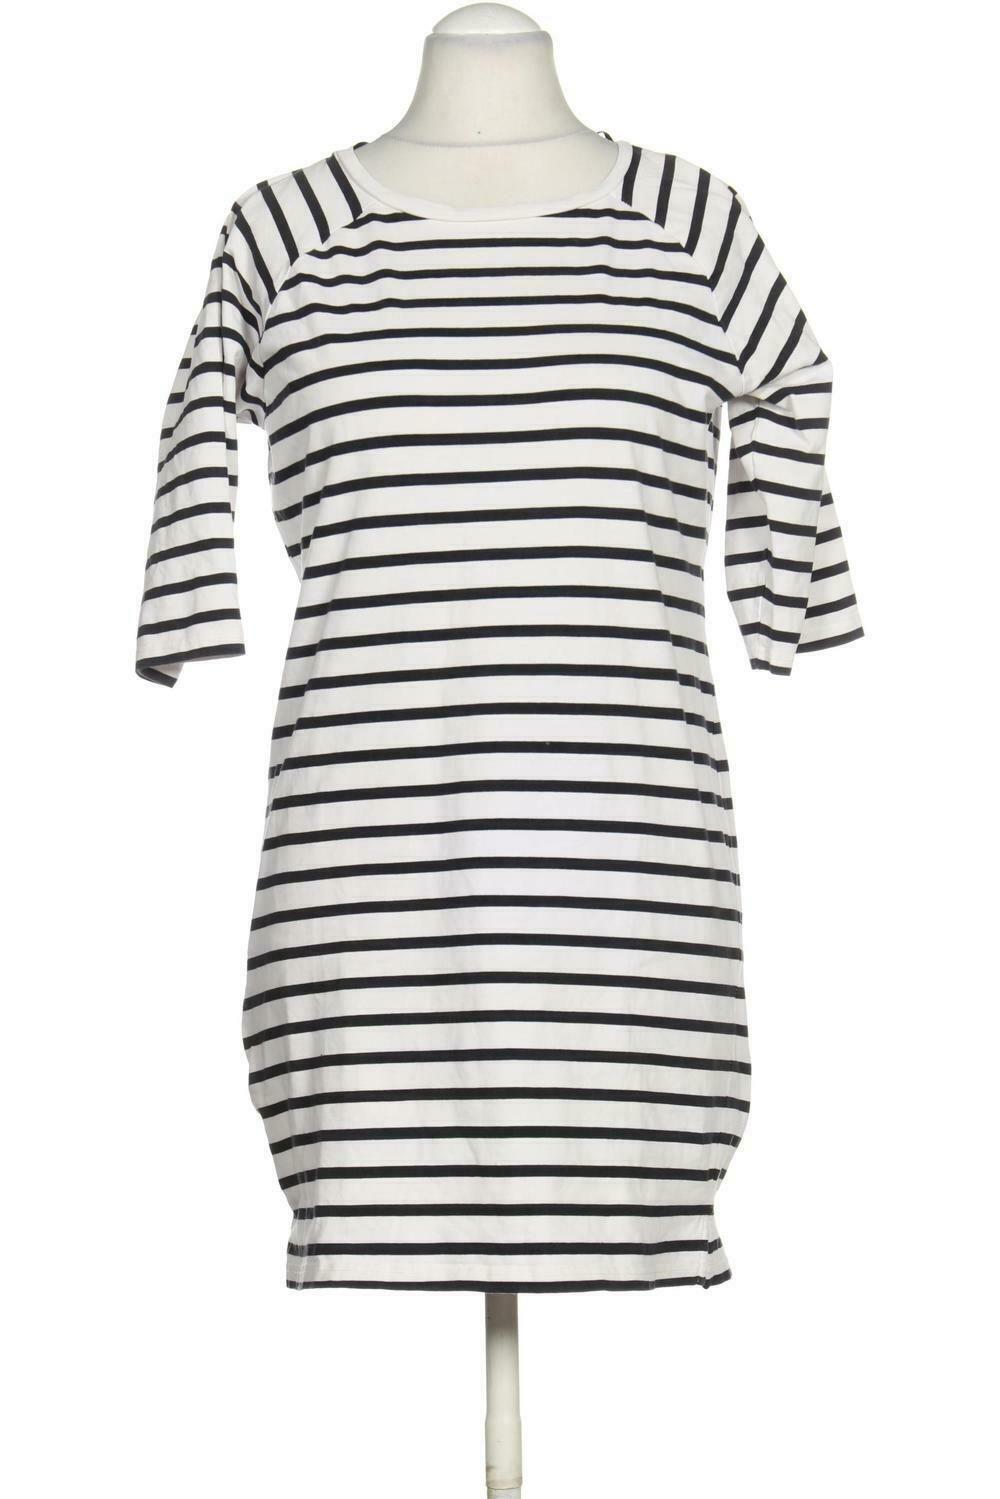 selected kleid damen dress damenkleid gr. l kein etikett